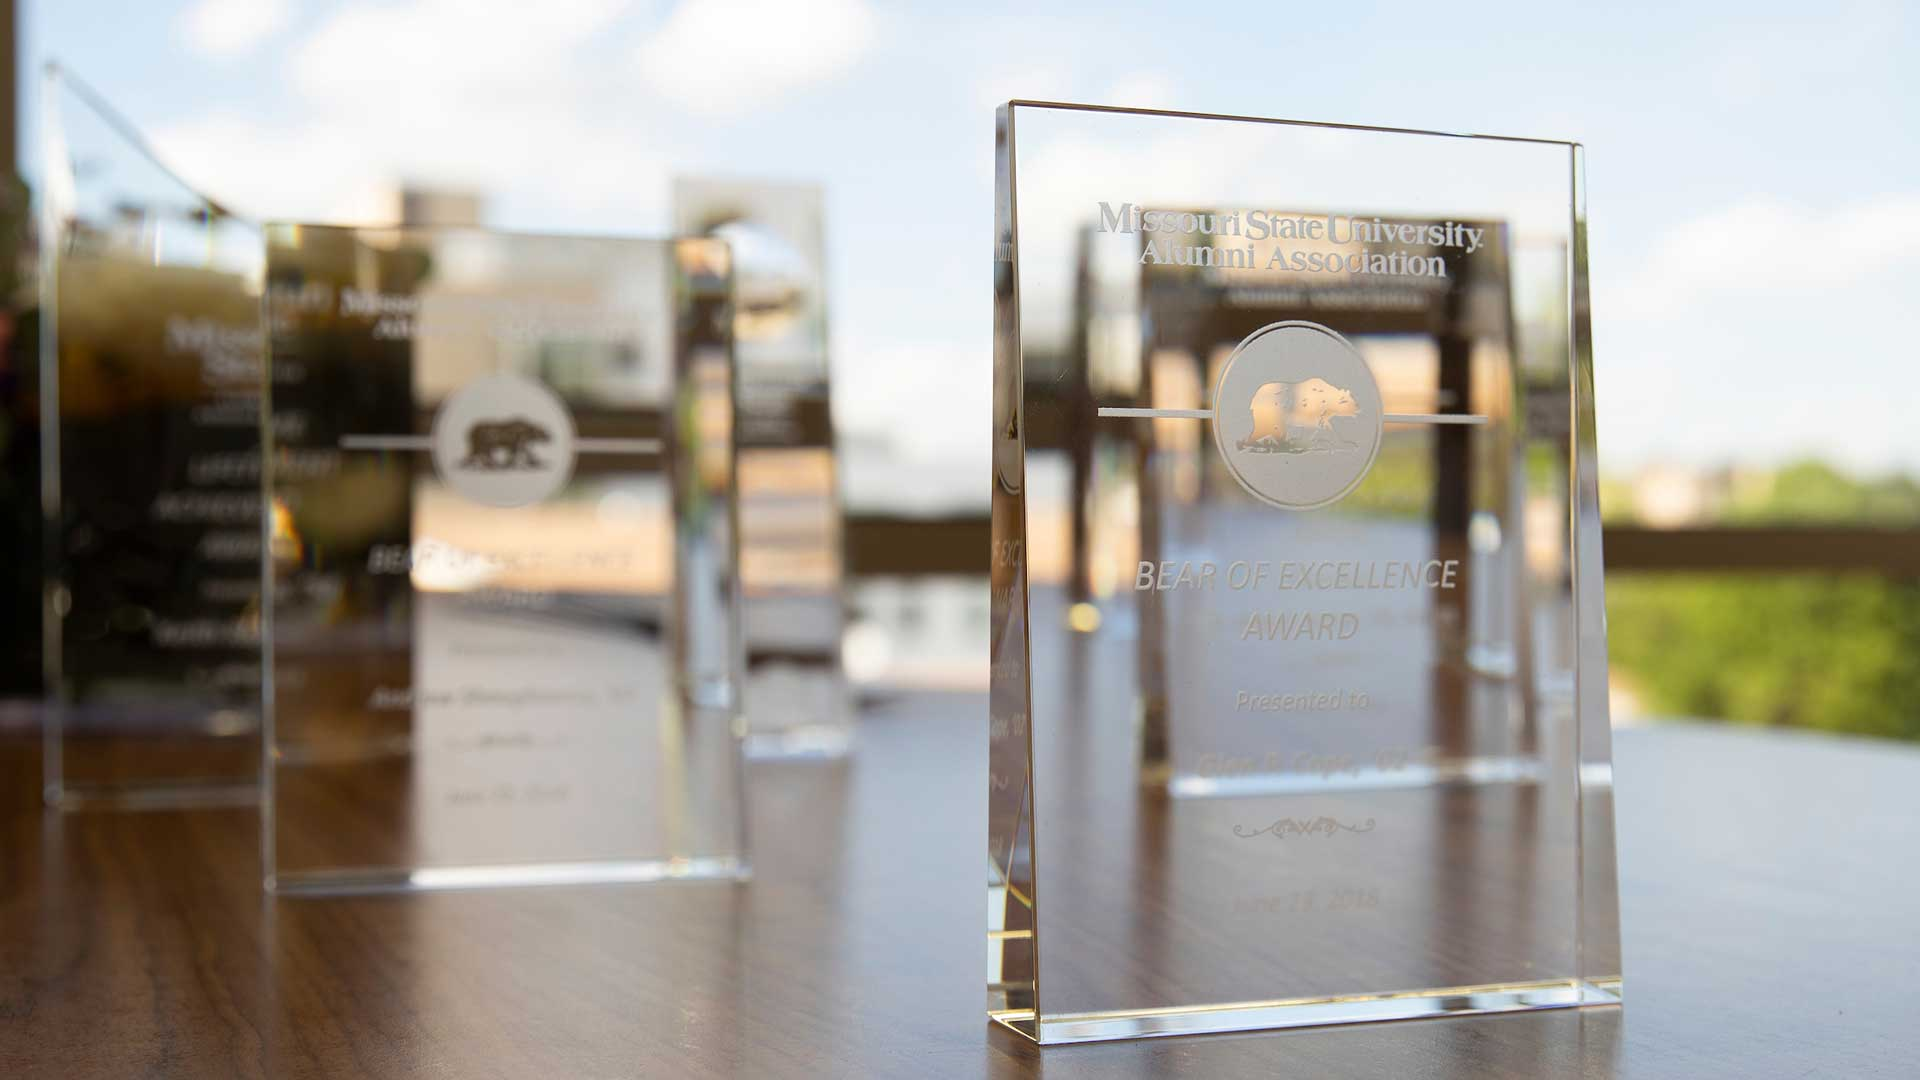 Bears of Distinction awards